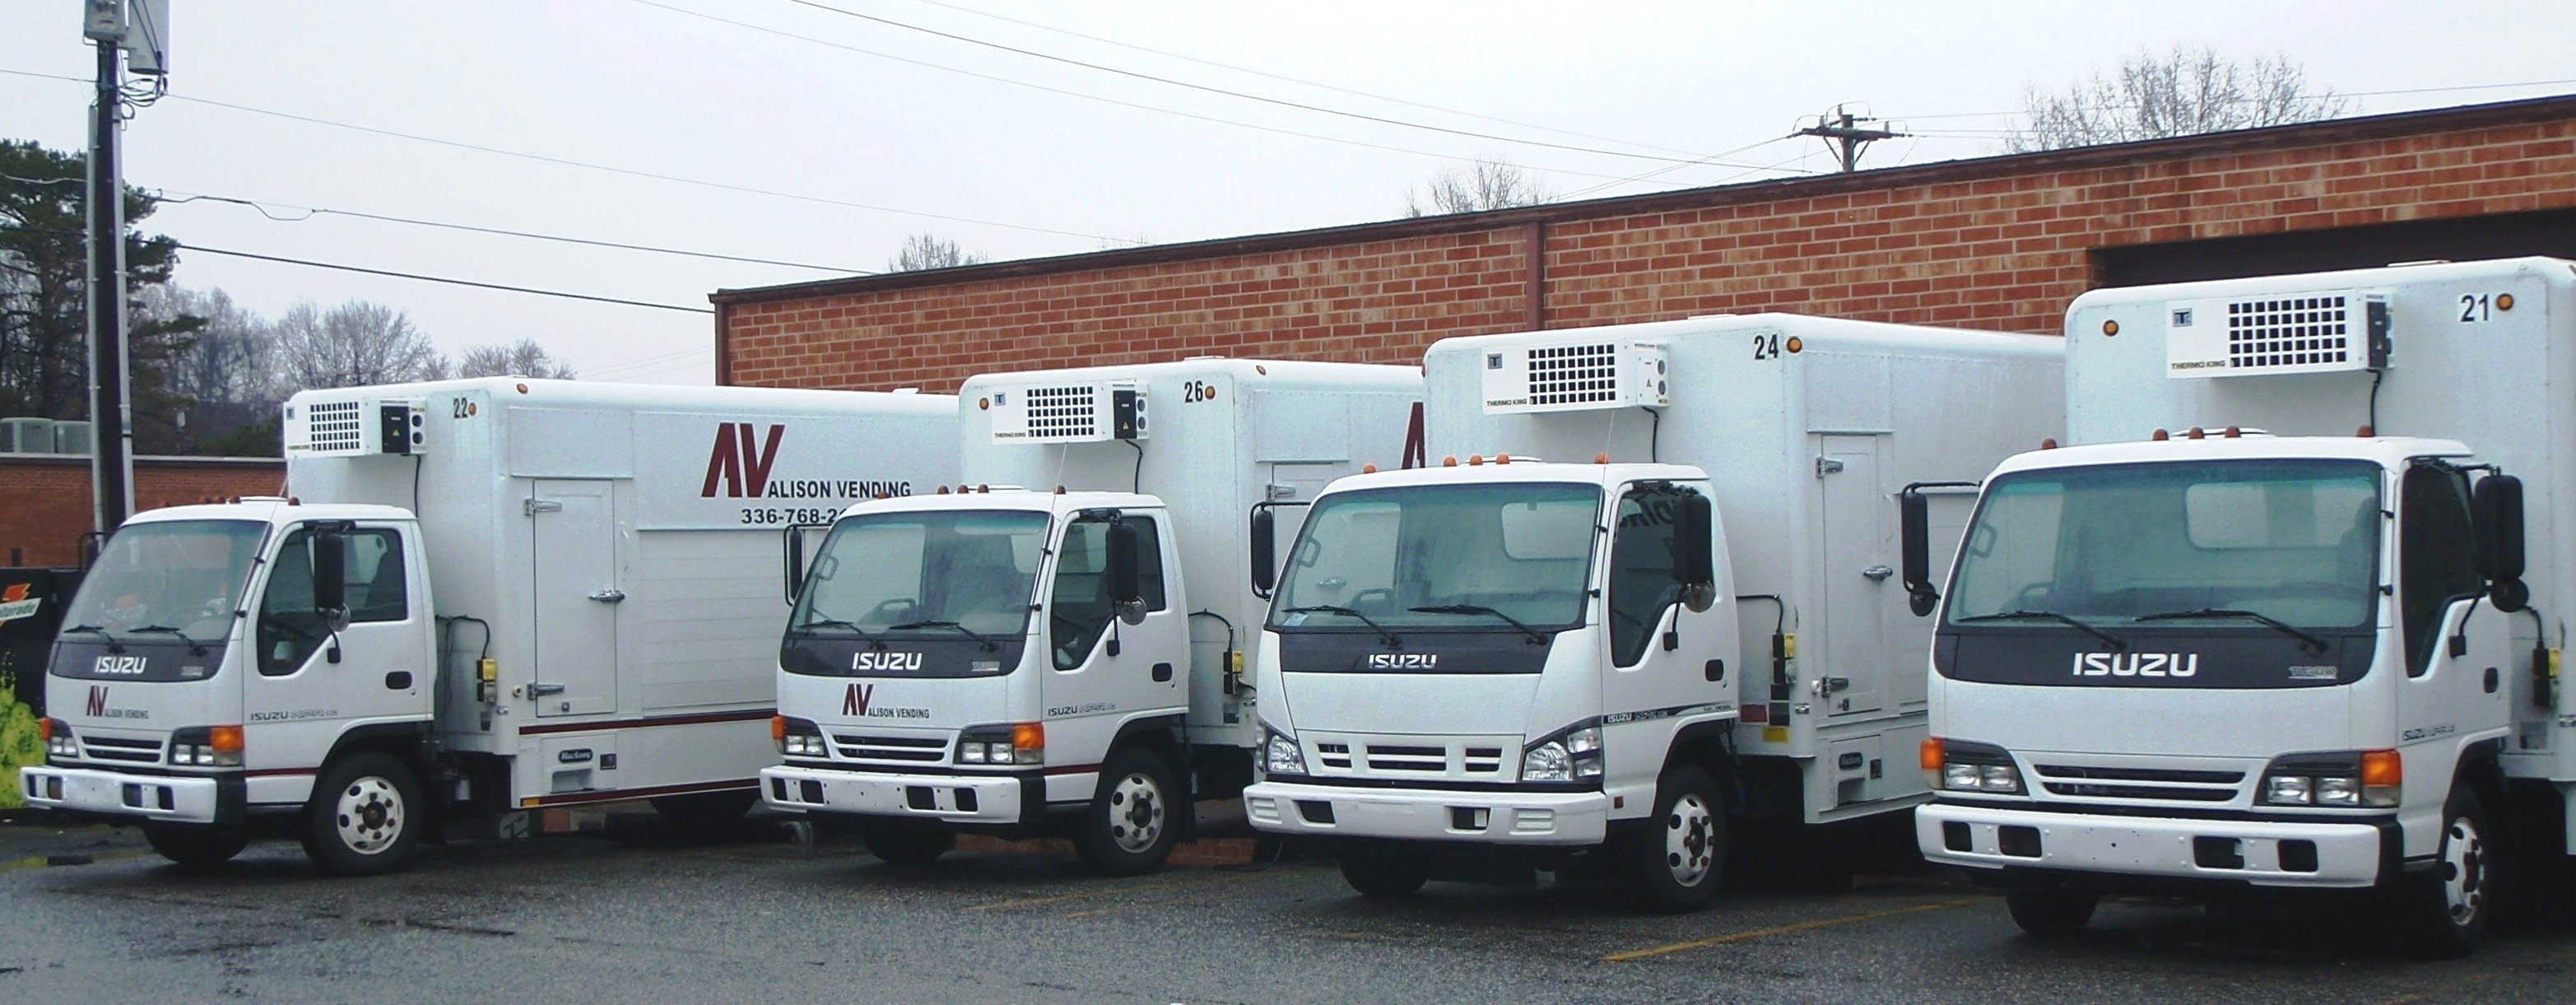 Trucks for Vending Machine Transportation, Salisbury NC